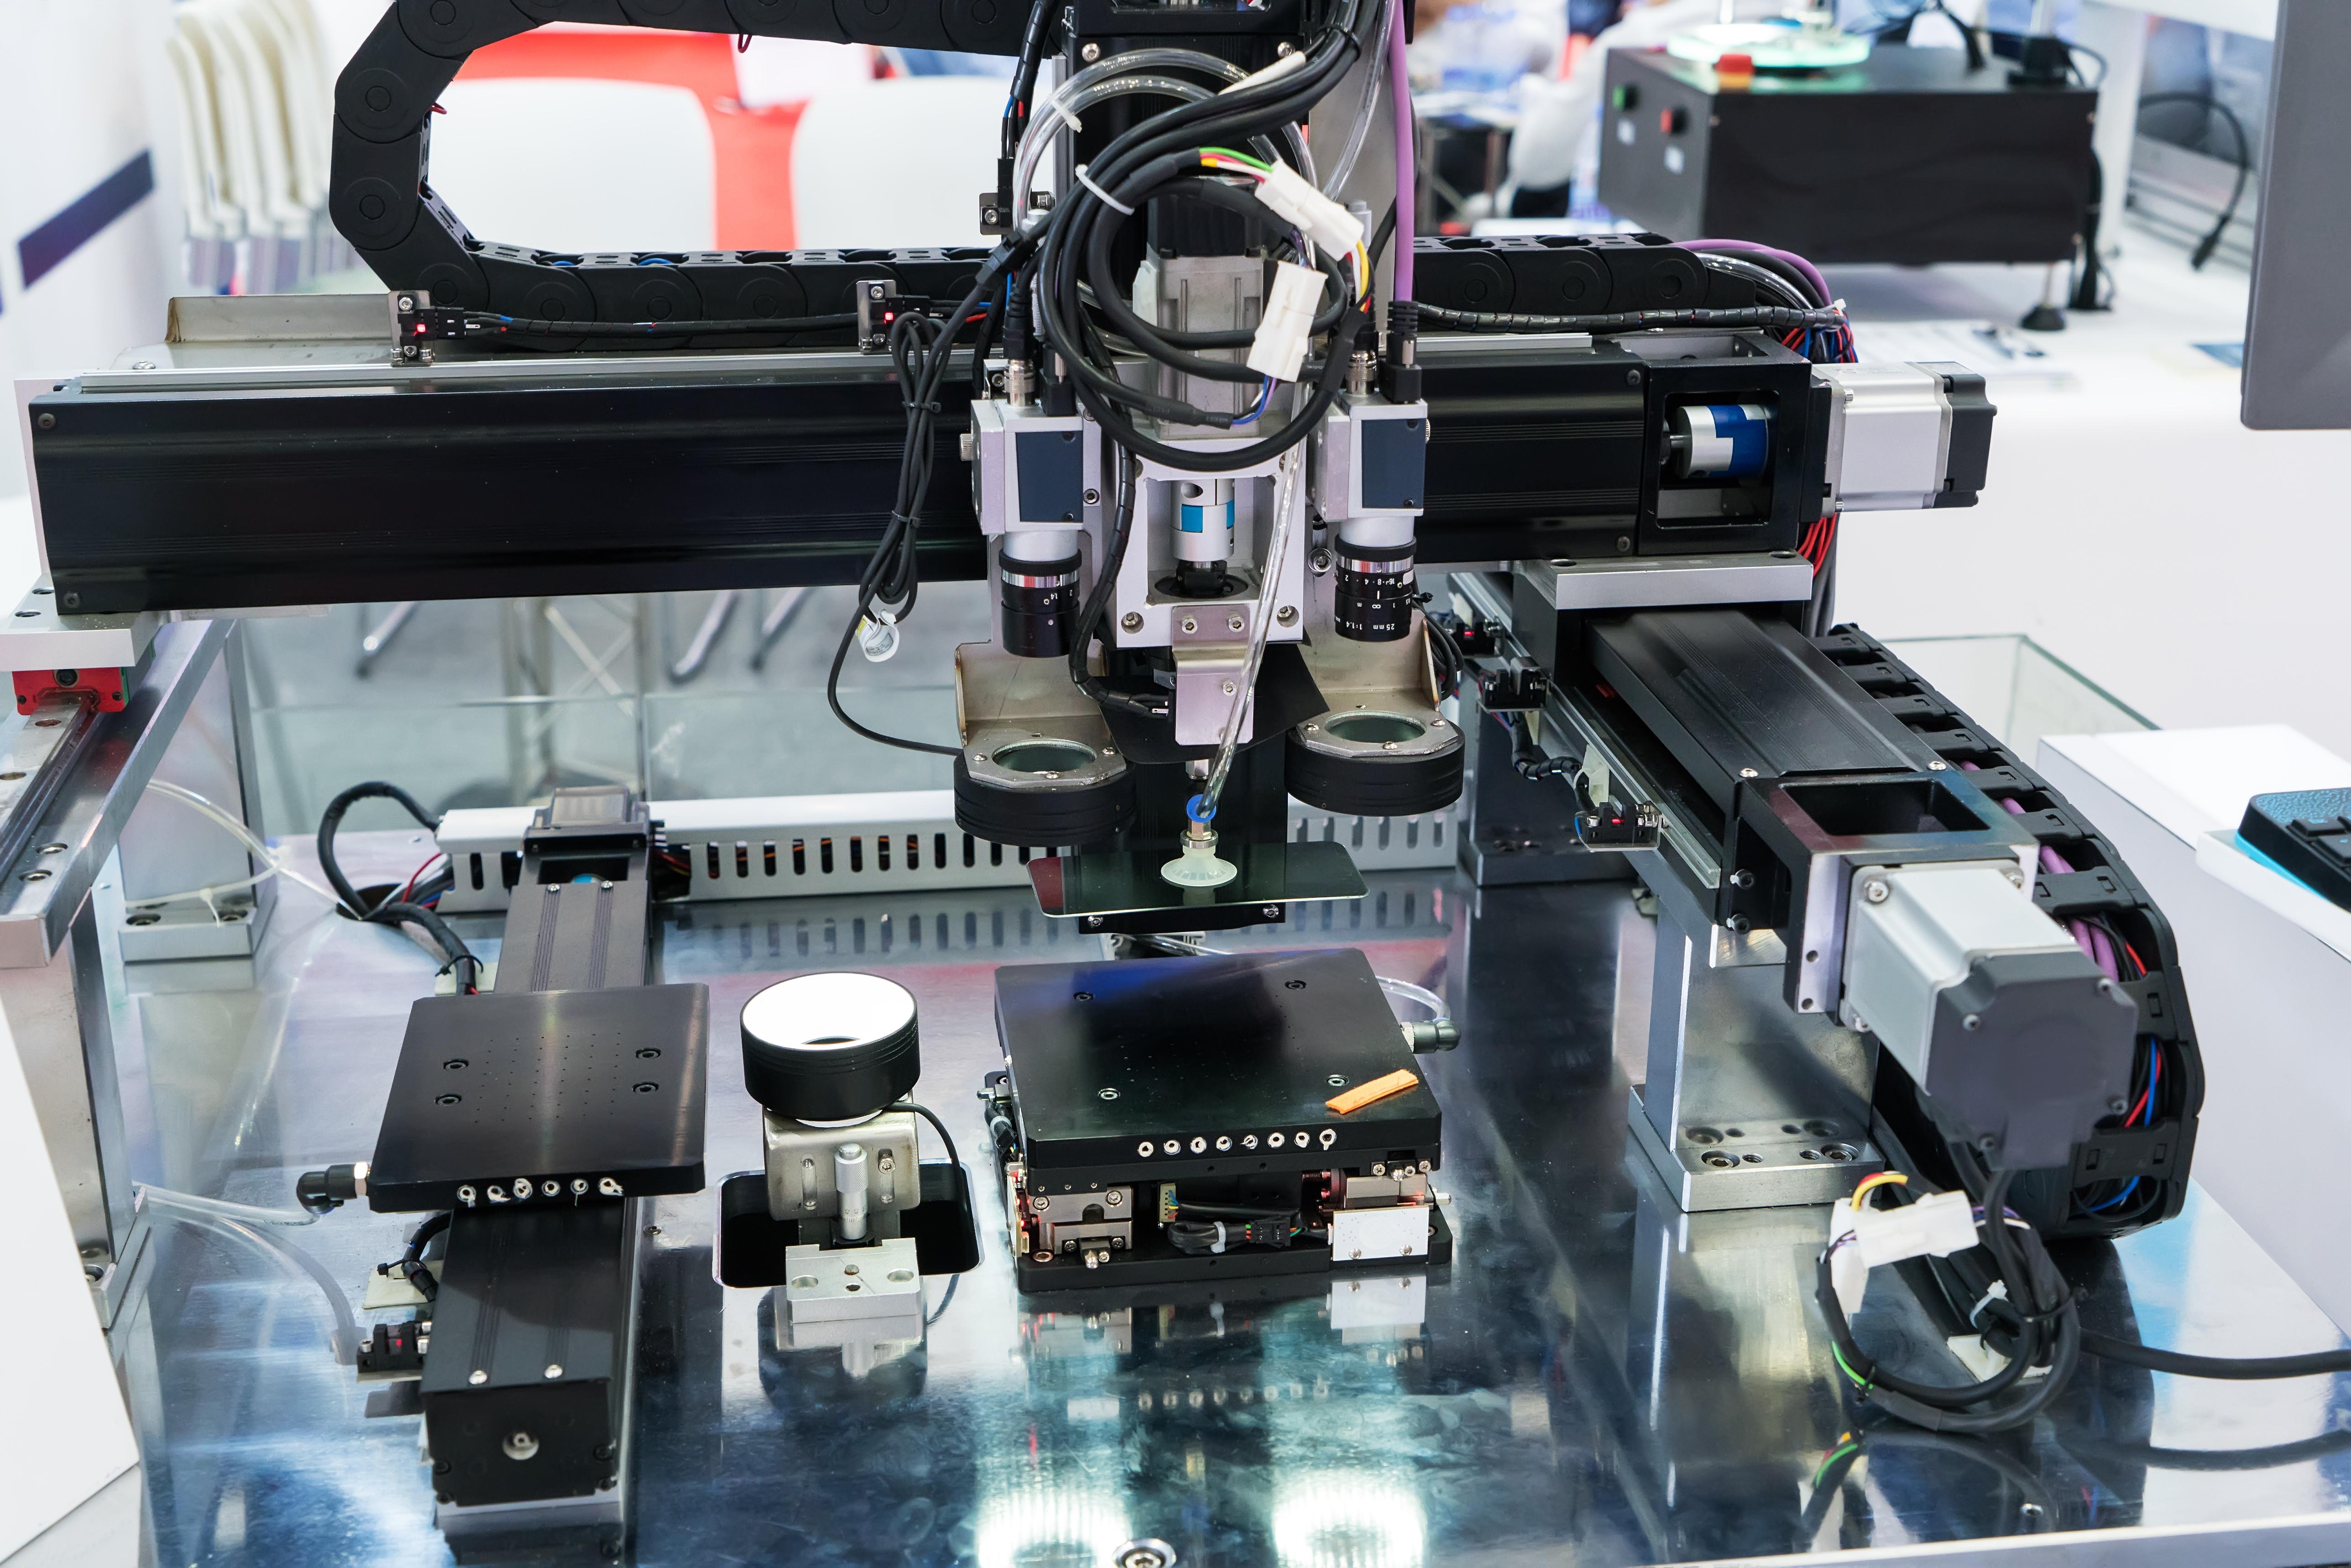 small gantry system with servo motors